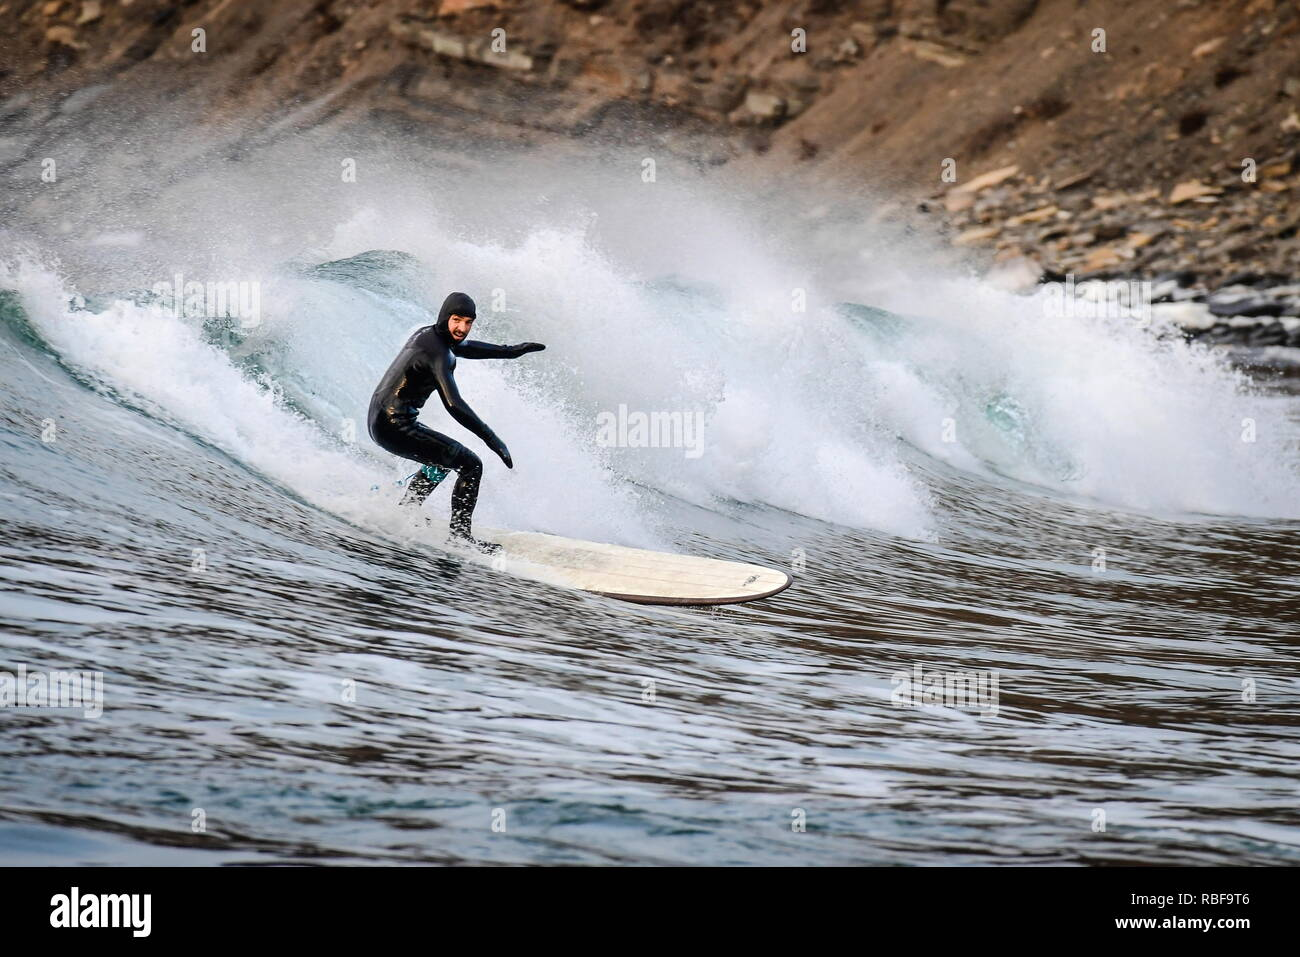 Vladivostok, Russia. 10th Jan, 2019. VLADIVOSTOK, RUSSIA - JANUARY 10, 2019: A man riding a wave in the Ussuri Bay by Russky Island. Yuri Smityuk/TASS Credit: ITAR-TASS News Agency/Alamy Live News - Stock Image